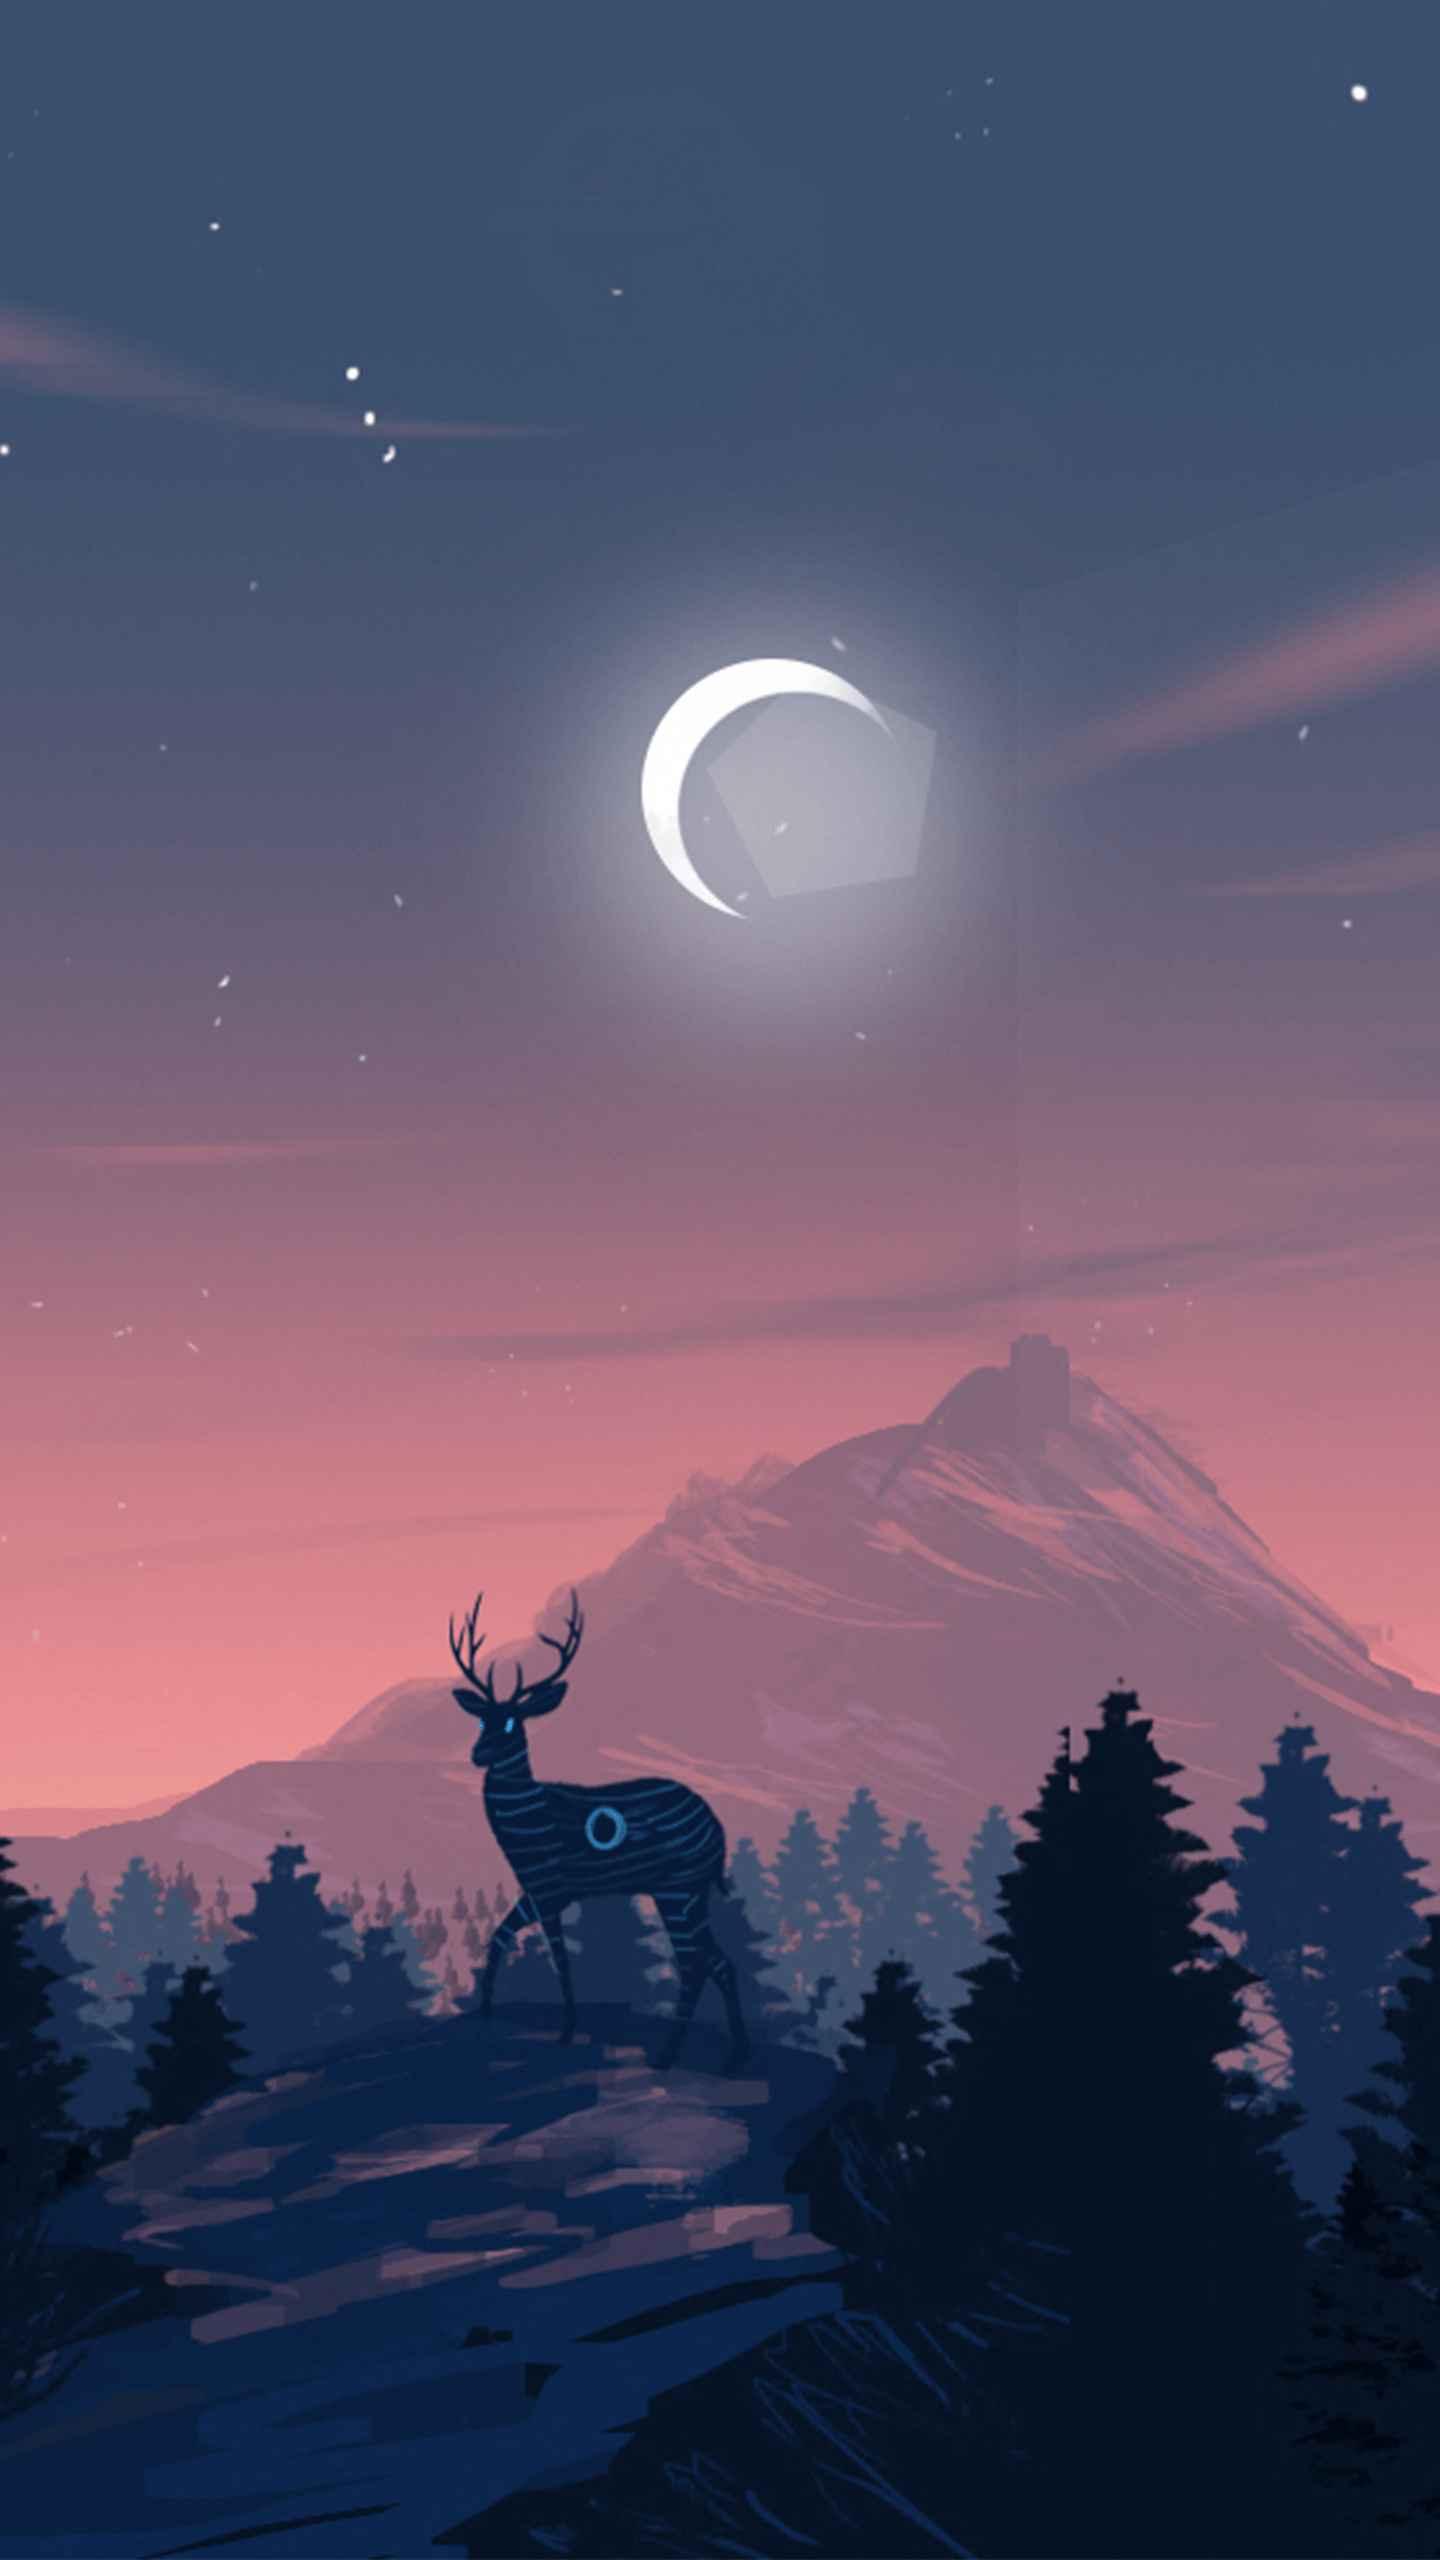 Deer Forest night iPhone Wallpaper